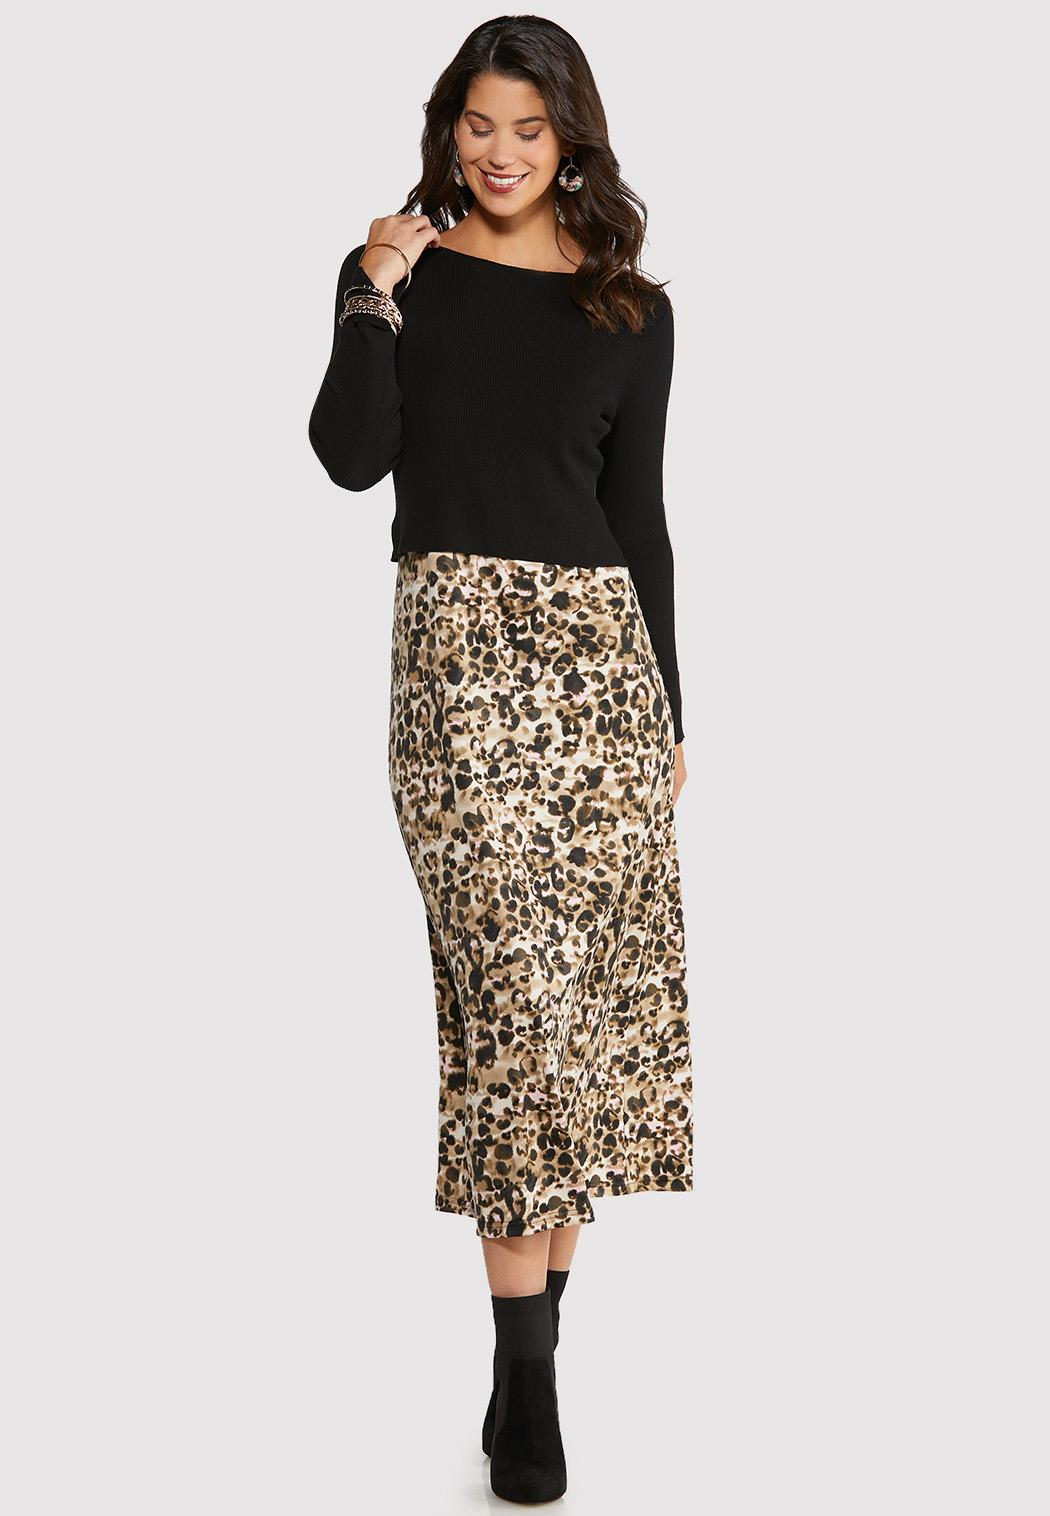 Leopard Slip and Sweater Dress Set